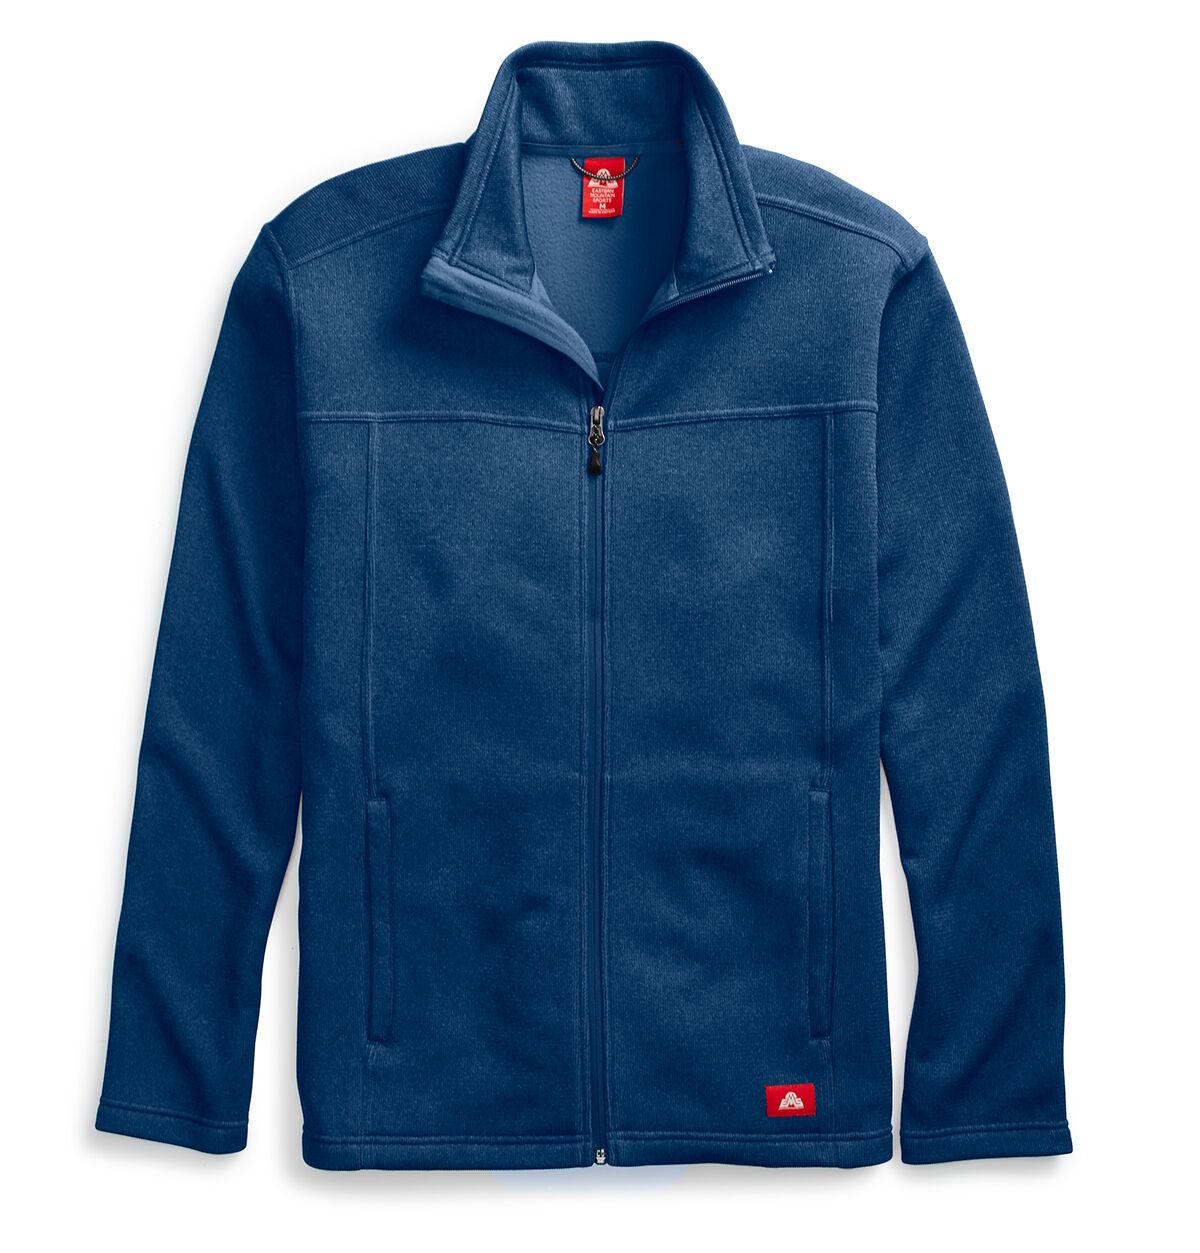 EMS Men's Destination Full-Zip Jacket - Size XL